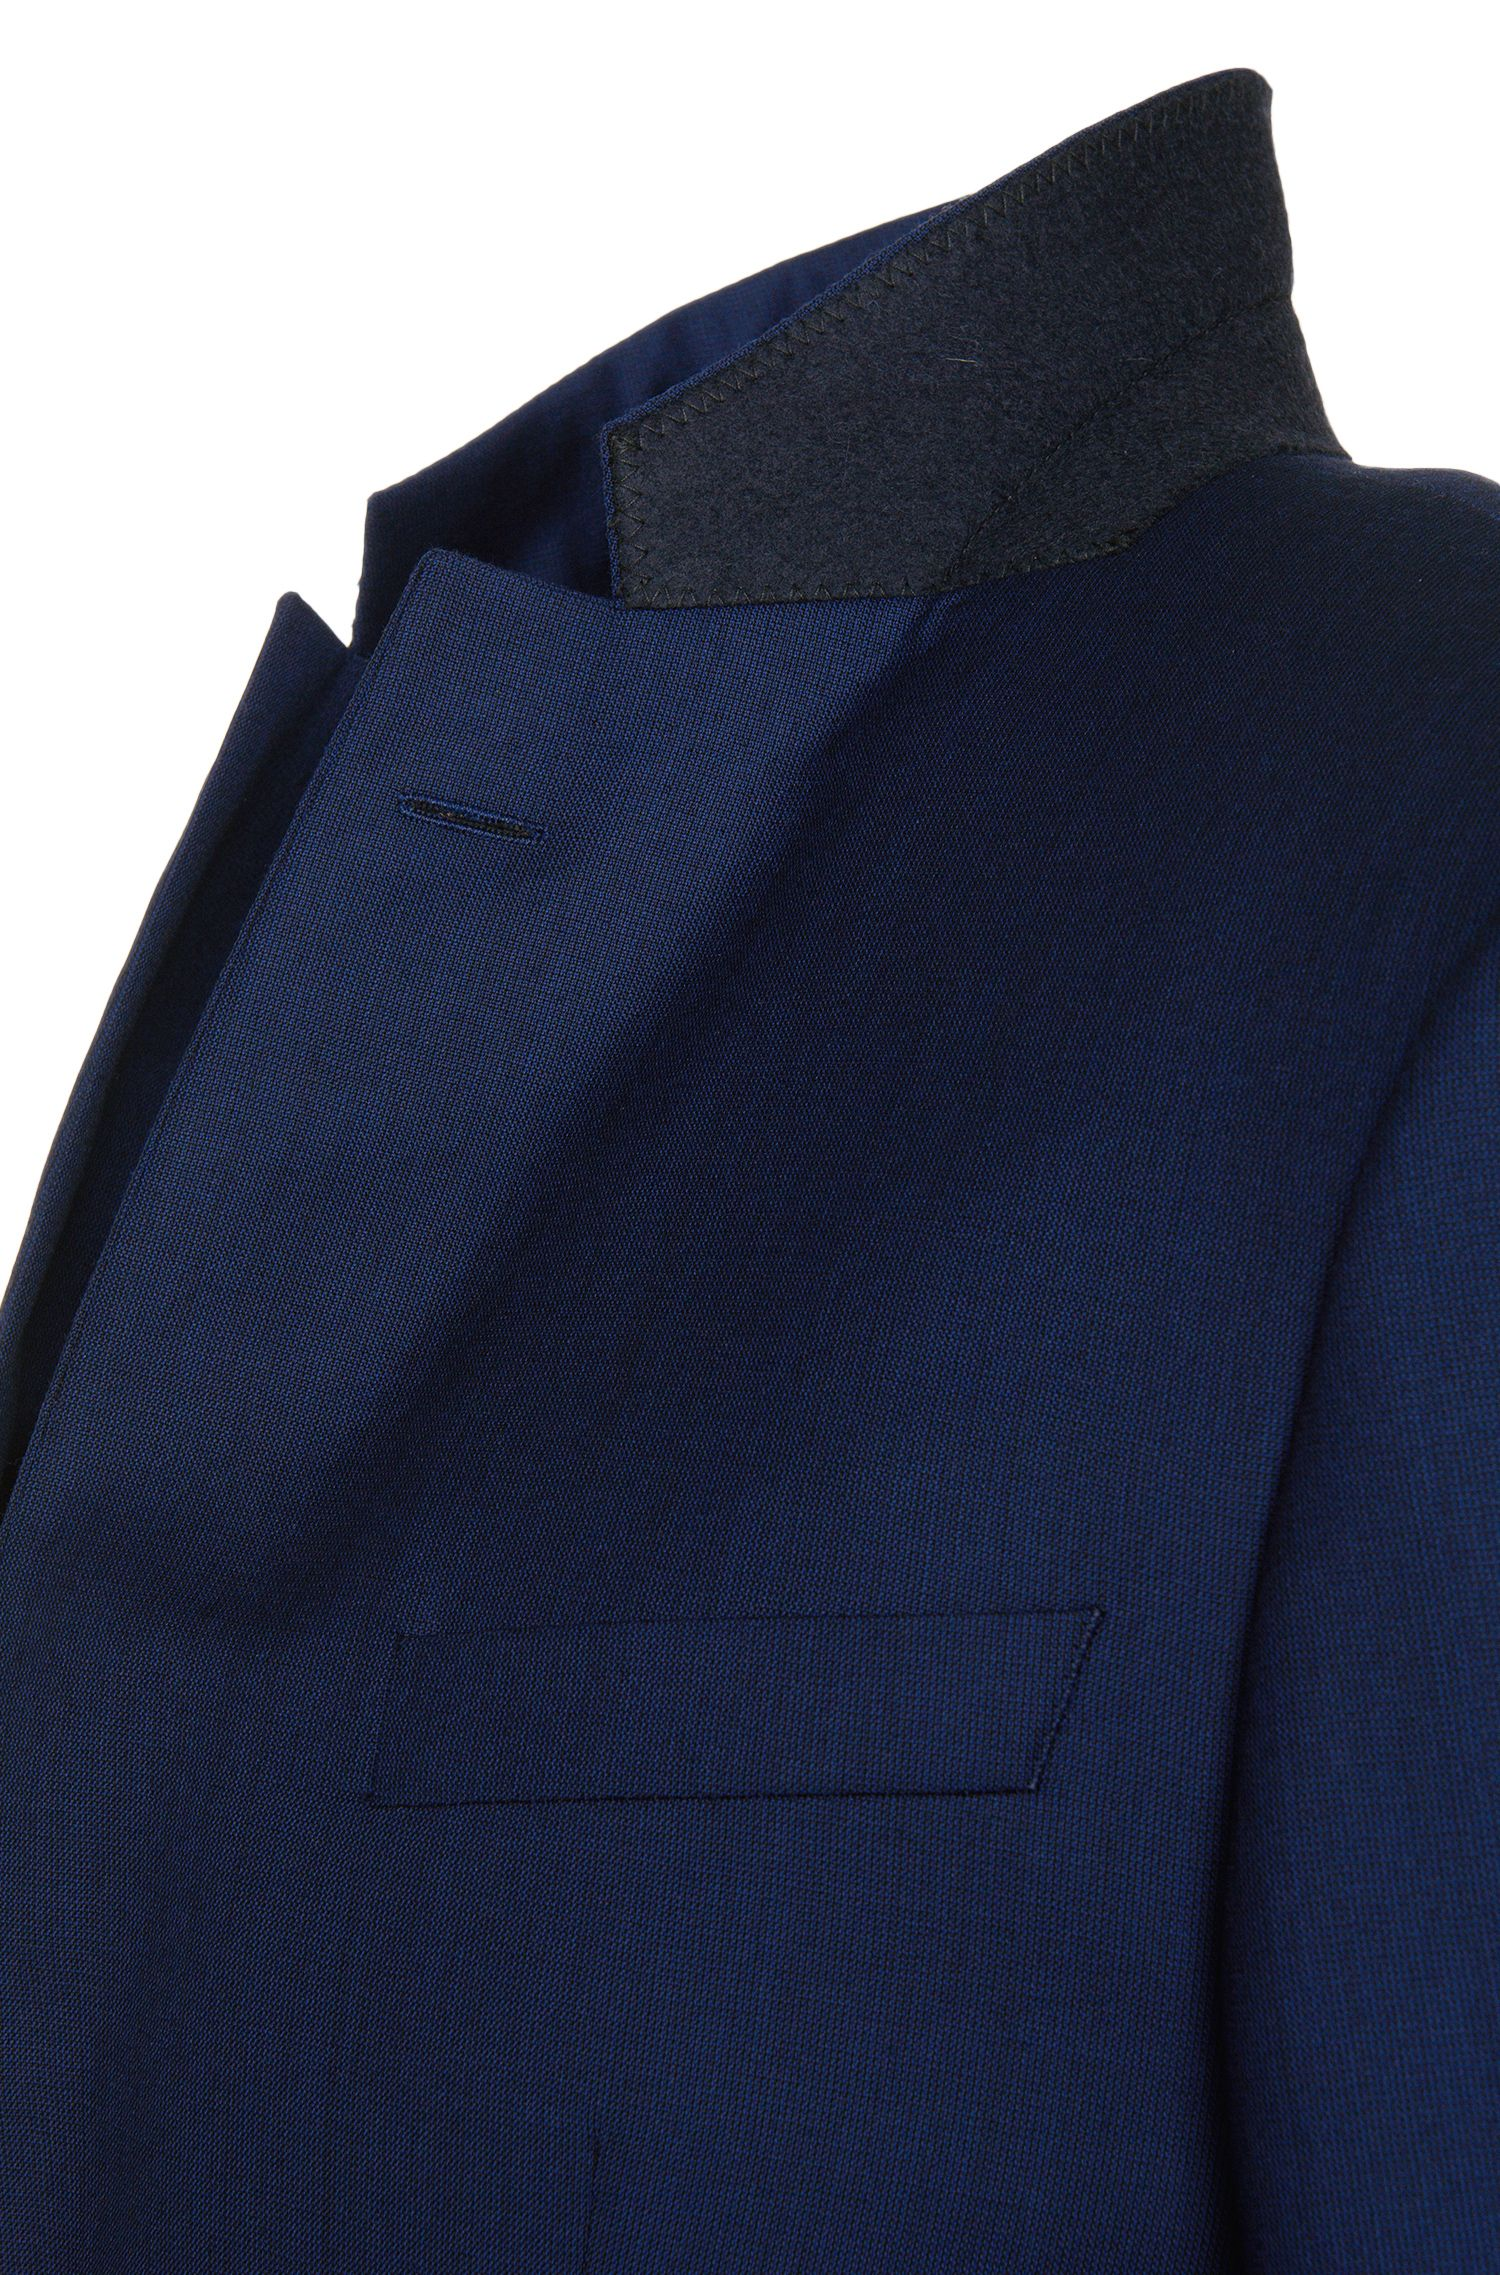 Costume Slim Fit en fine laine vierge: «T-Harvers1/Glover1»